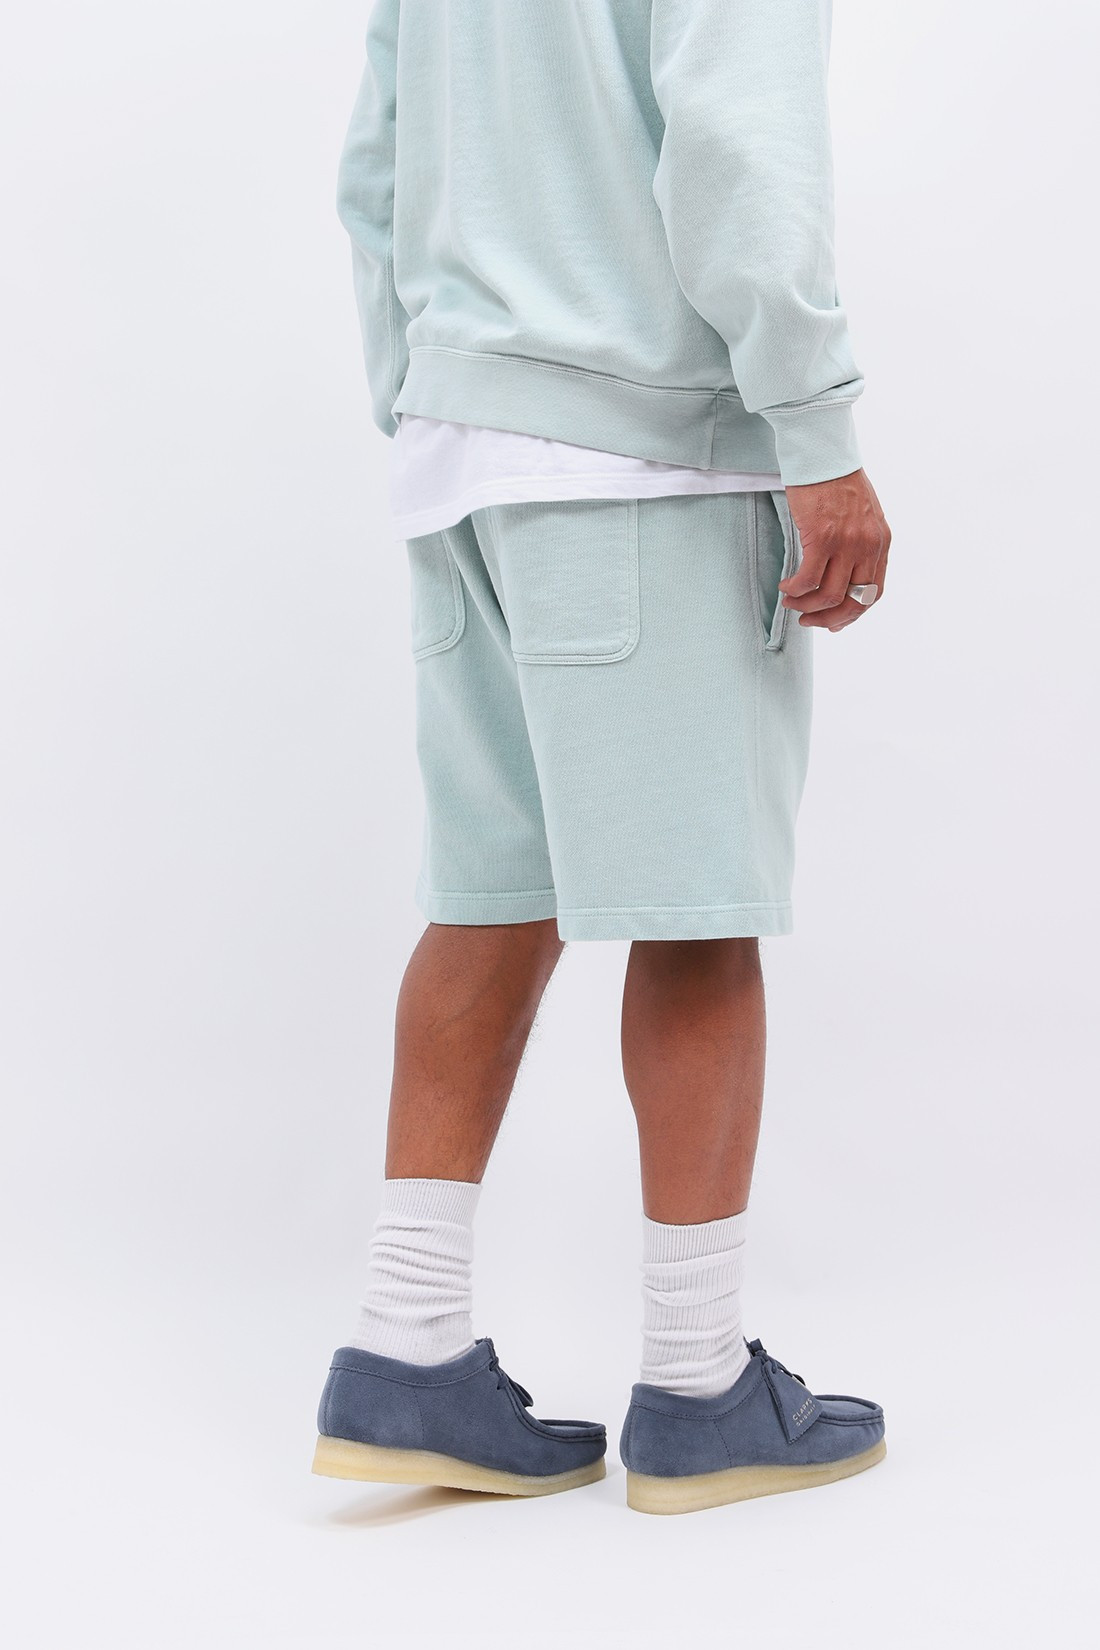 BEAMS PLUS / Athletic short sweat Mint green